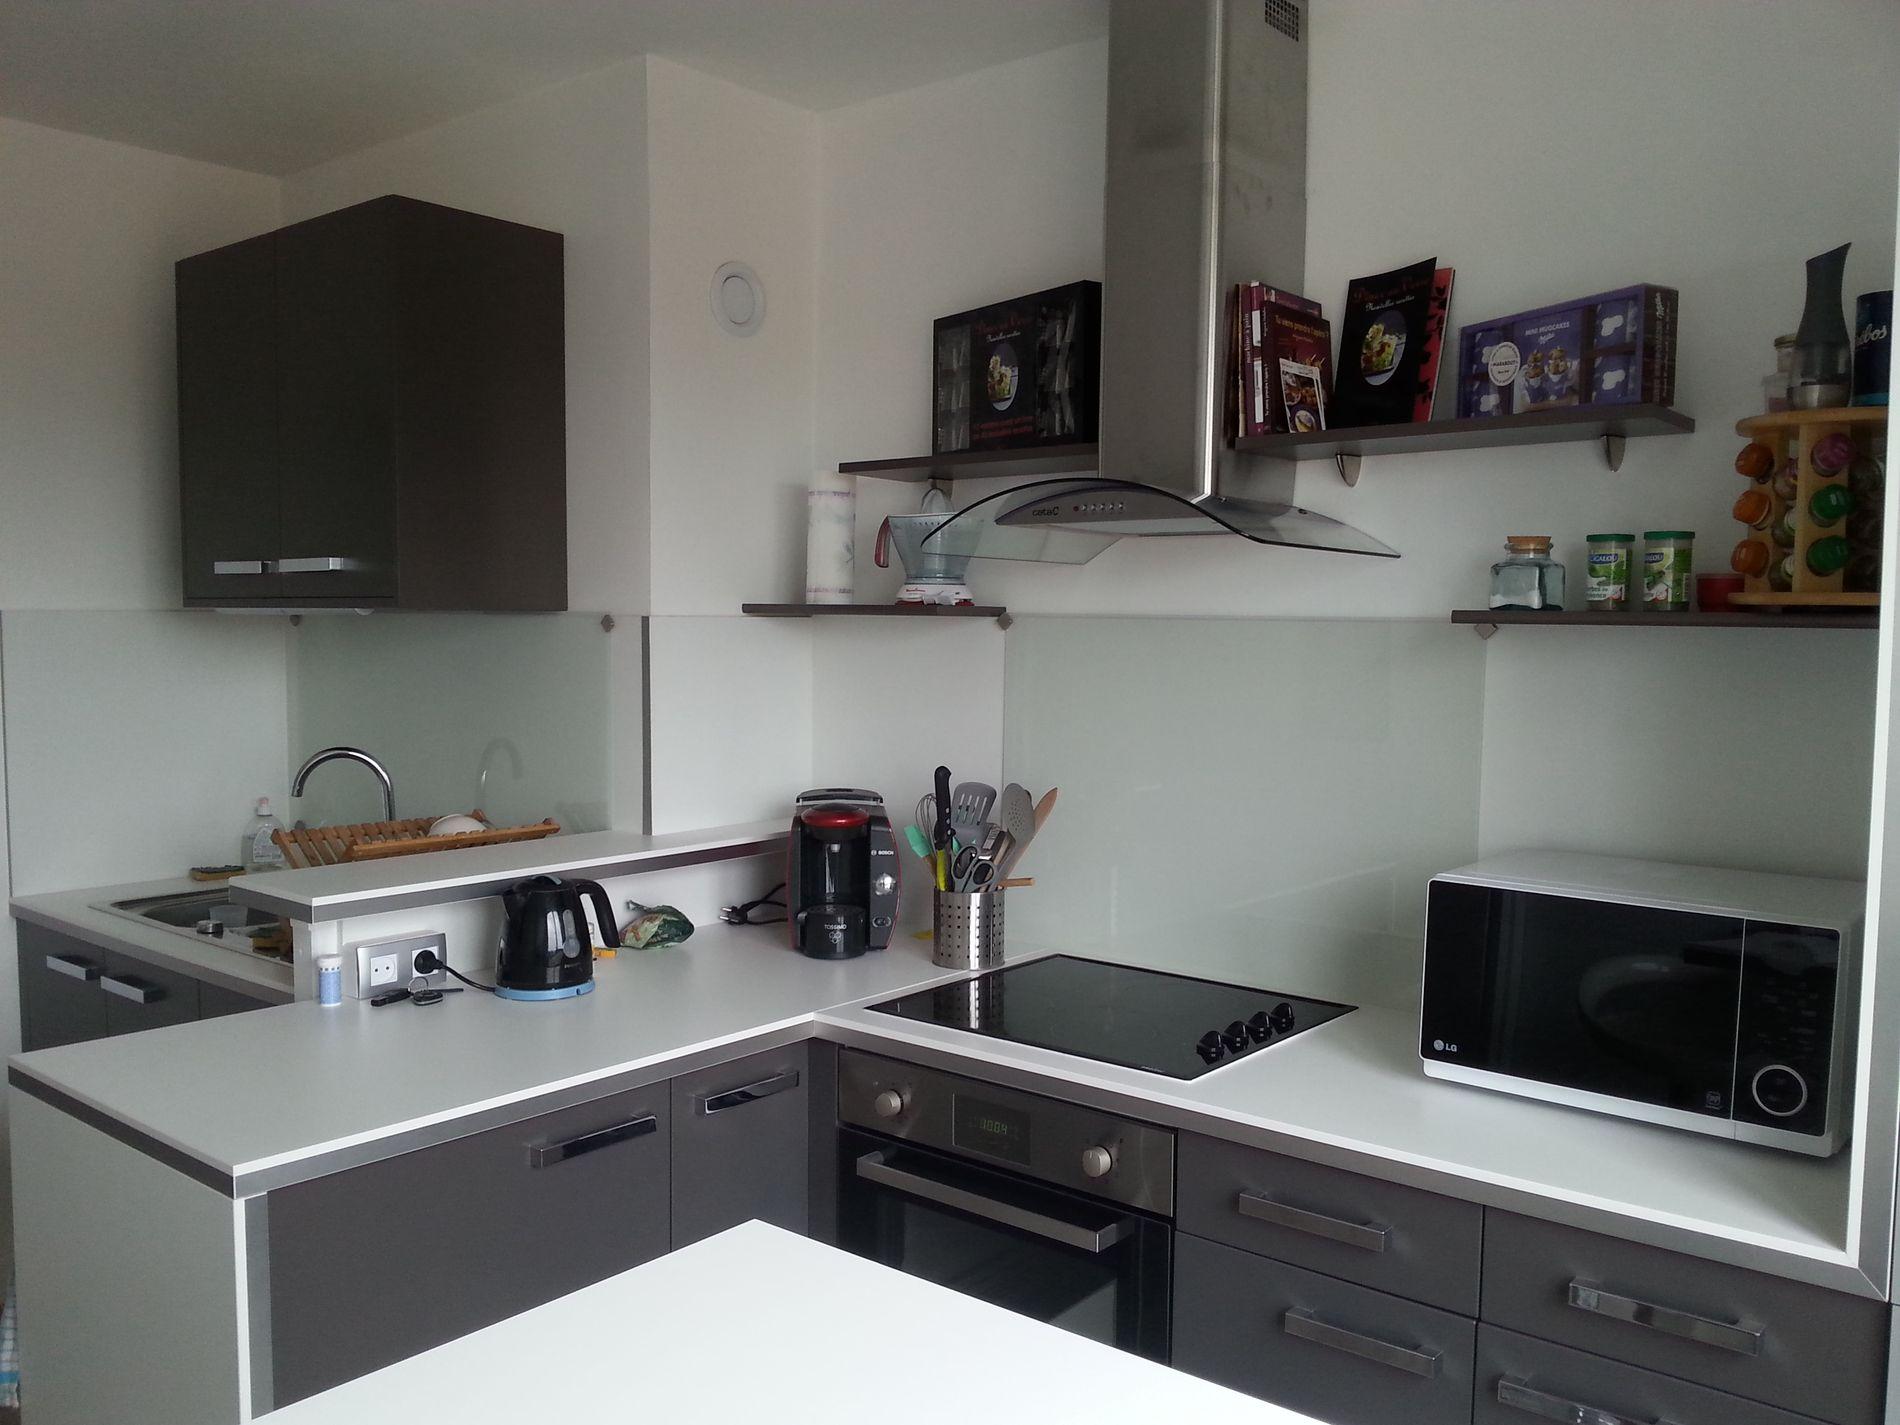 A vendre Appartement F3 ROUEN RIVE GAUCHE